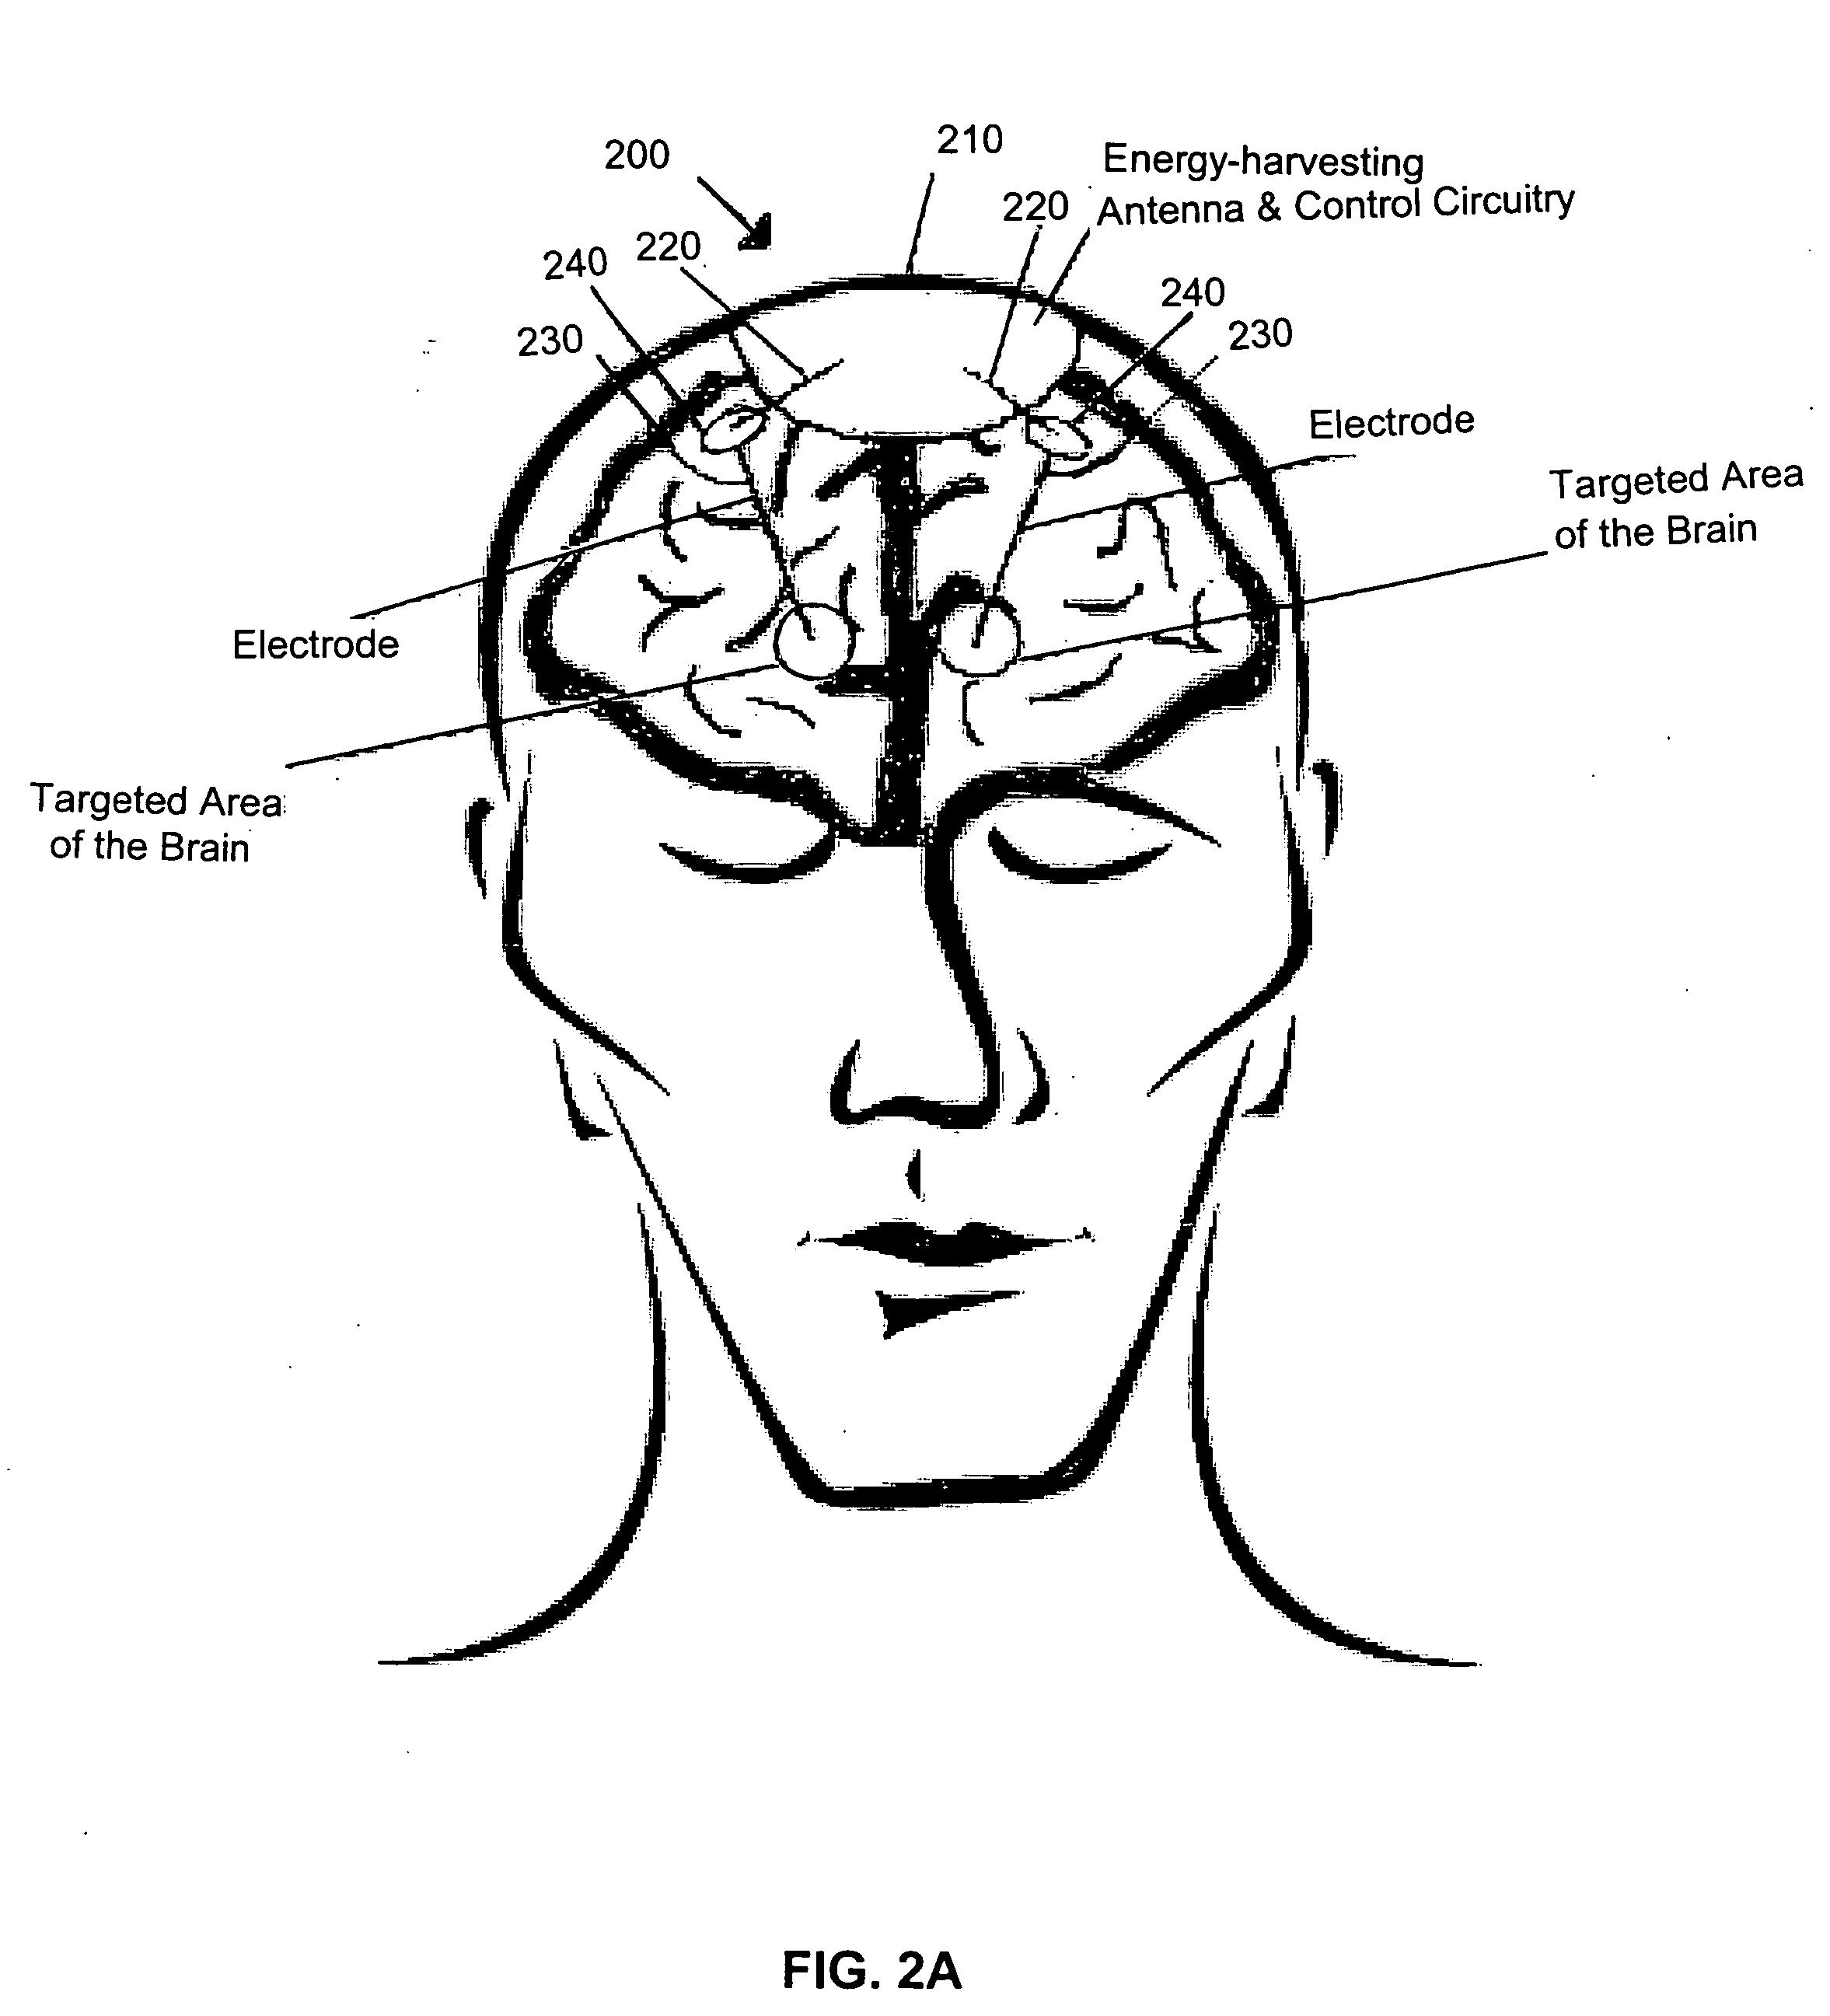 patent us20060184209 - device for brain stimulation using rf energy harvesting